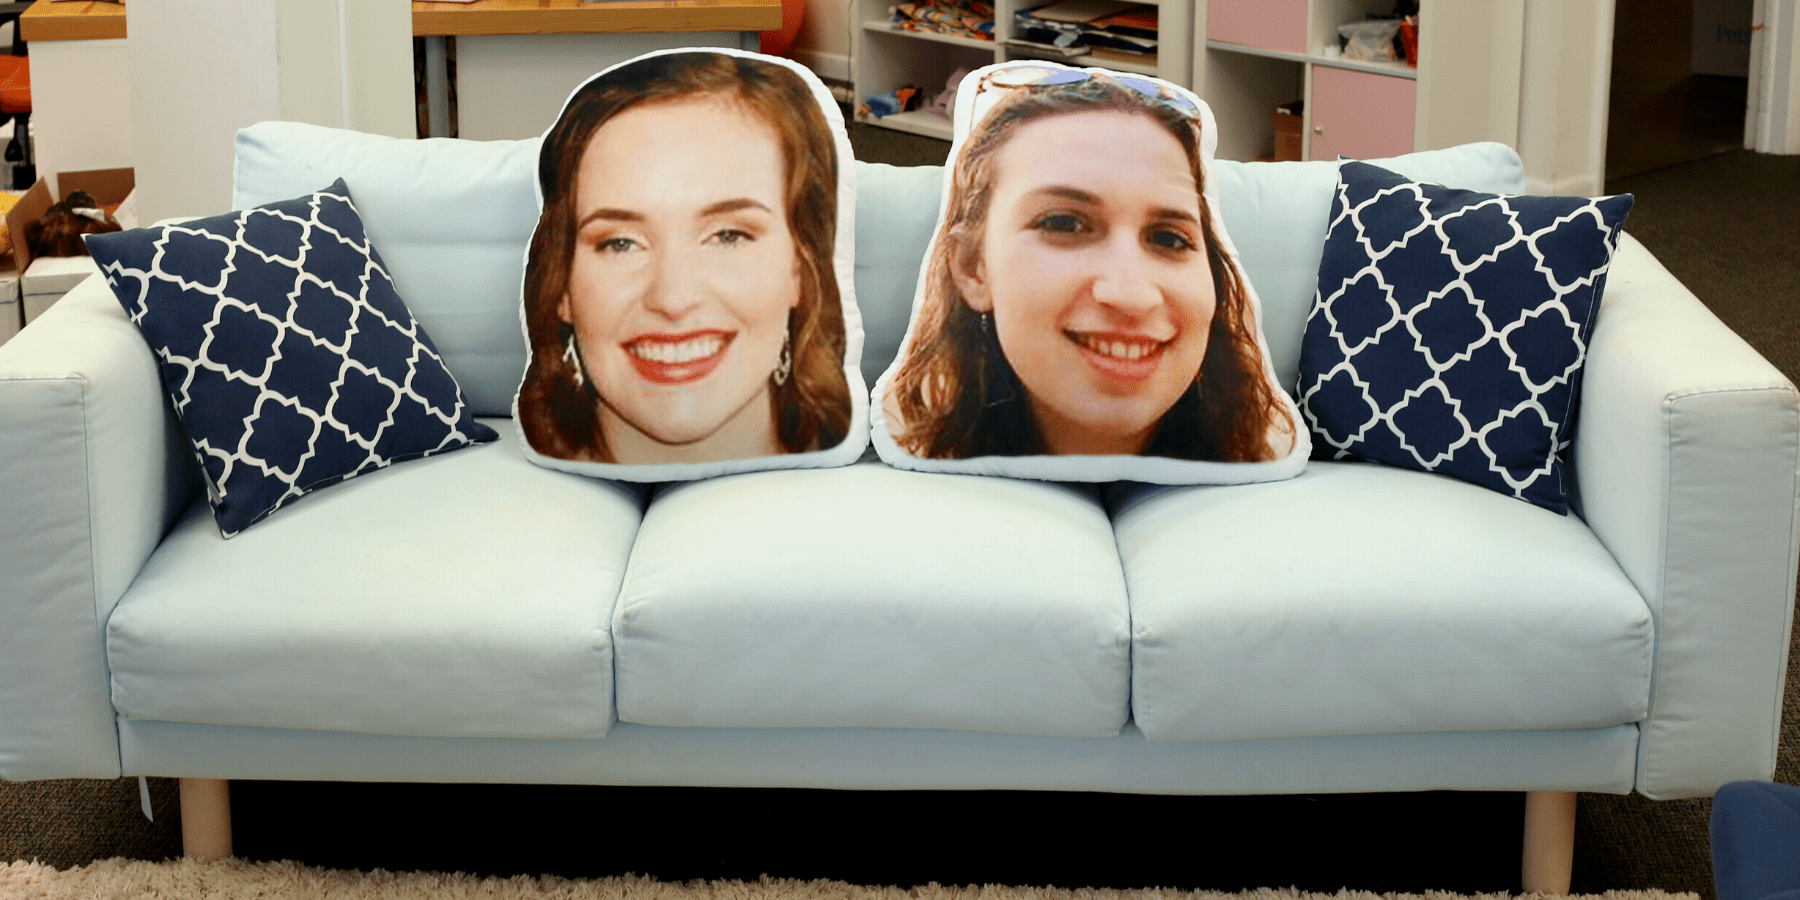 custom photo pillows of people